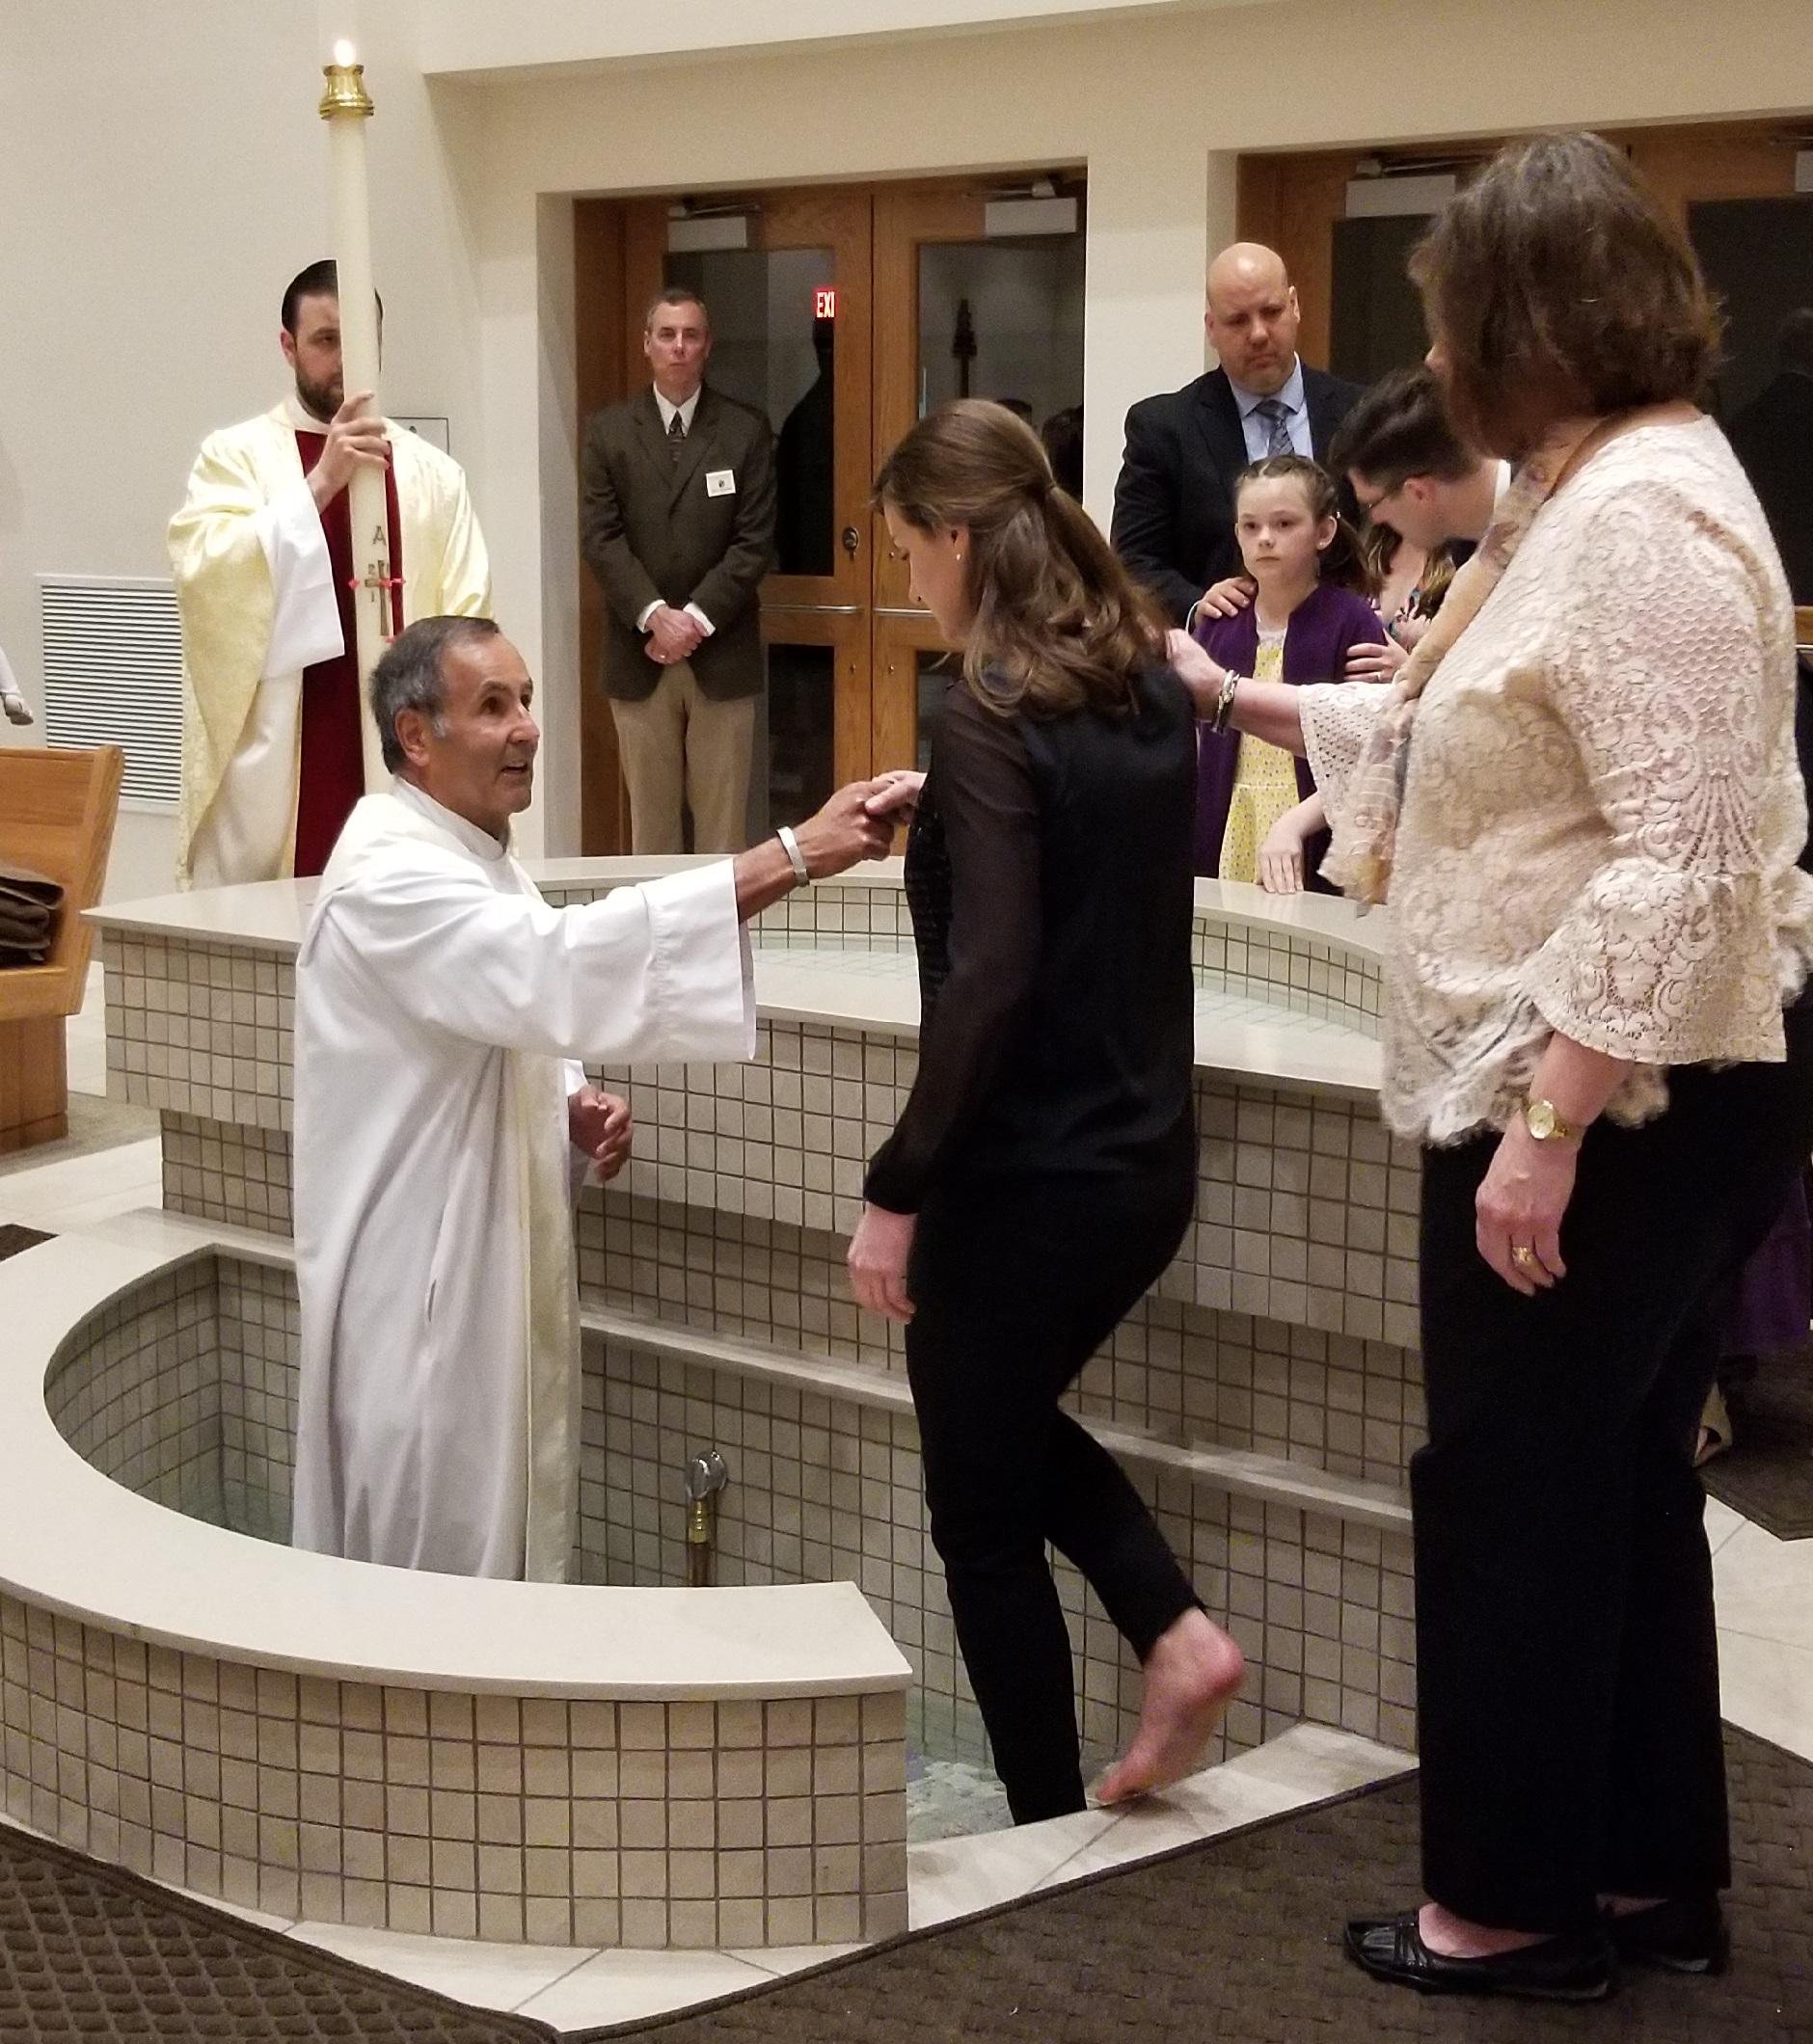 baptism 5.jpg